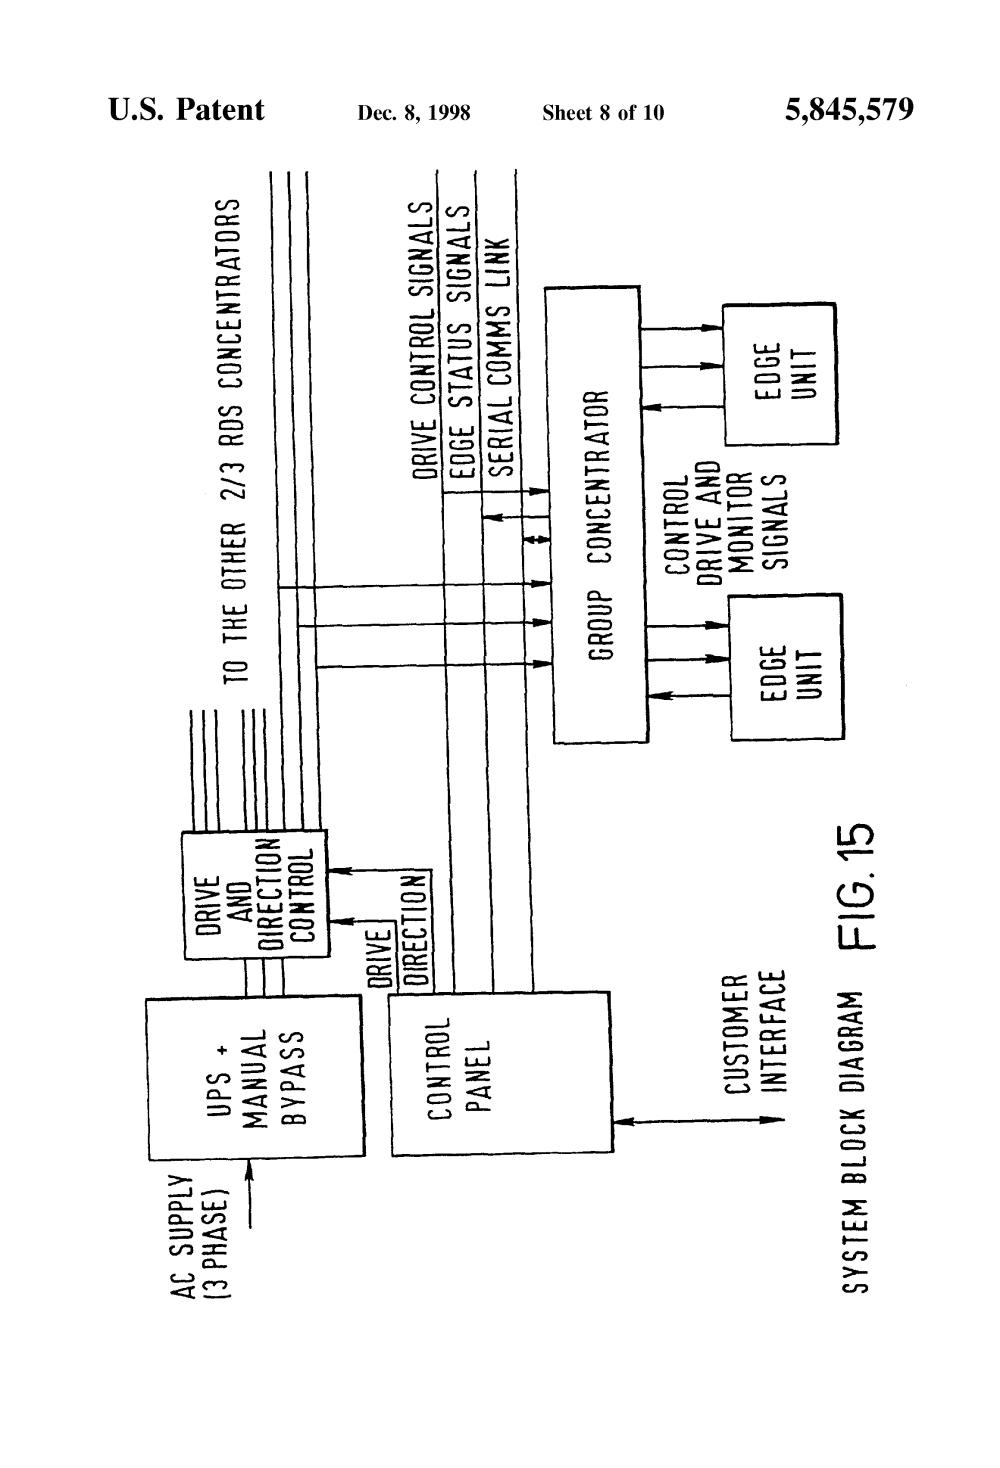 medium resolution of kaba wiring diagrams wiring diagramkaba wiring diagrams wiring librarylovely kaba wiring diagrams photos electrical circuit